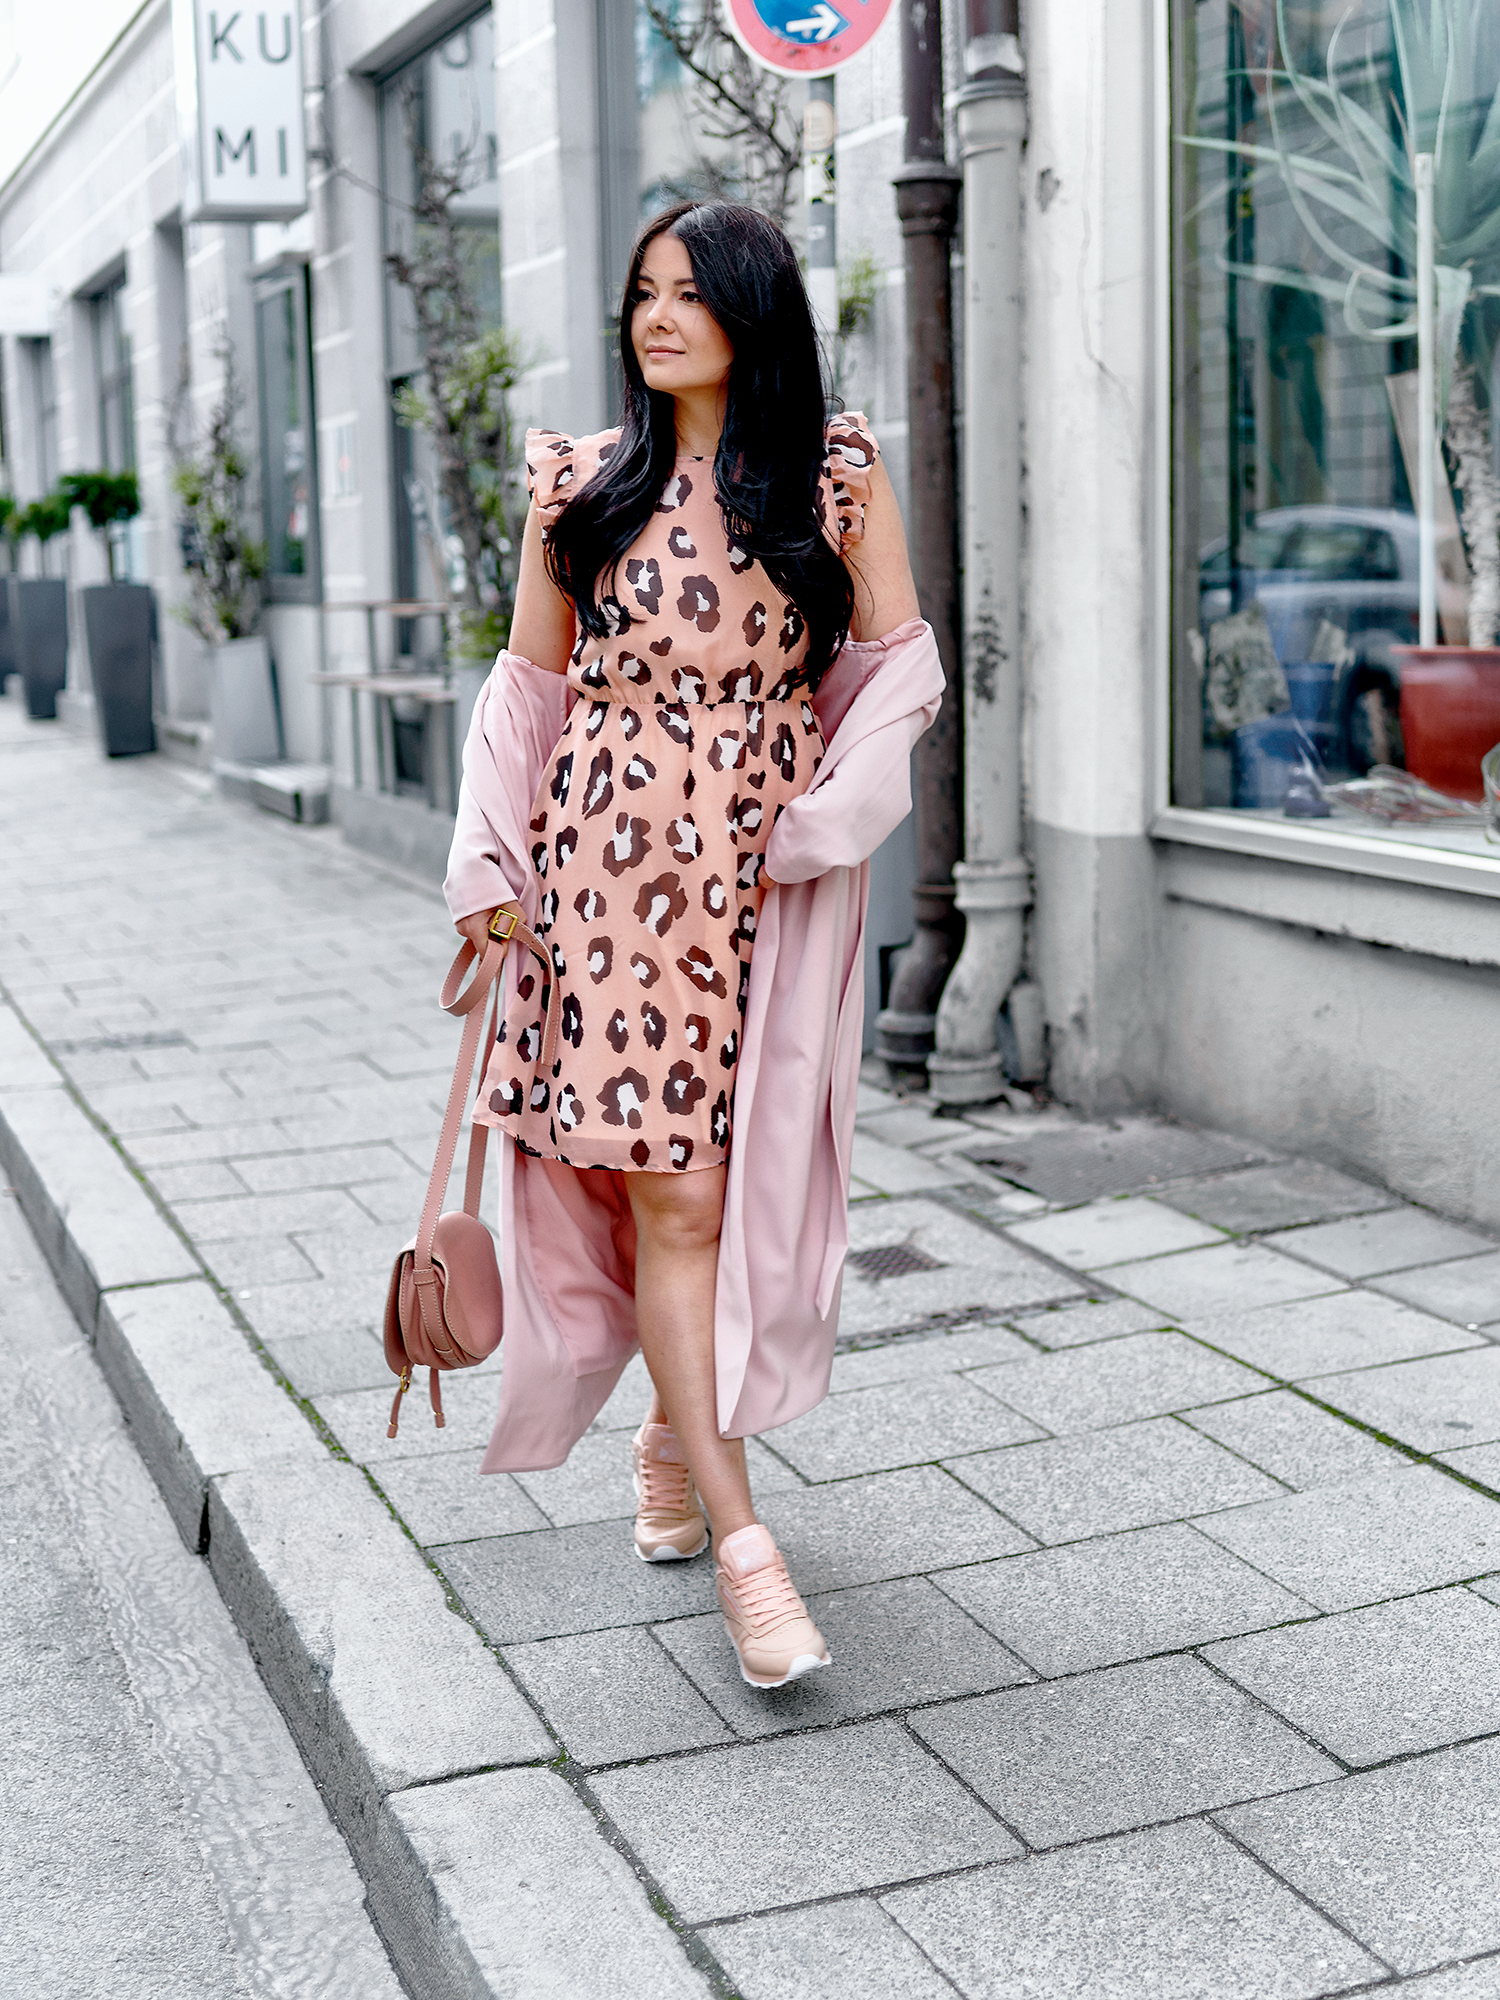 fashionambit-fashionblog-muenchen-modeblog-deutschland-blogger-modeblogger-fashionblogger-bloggerdeutschland-lifestyleblog-munich-style-blog-rosa